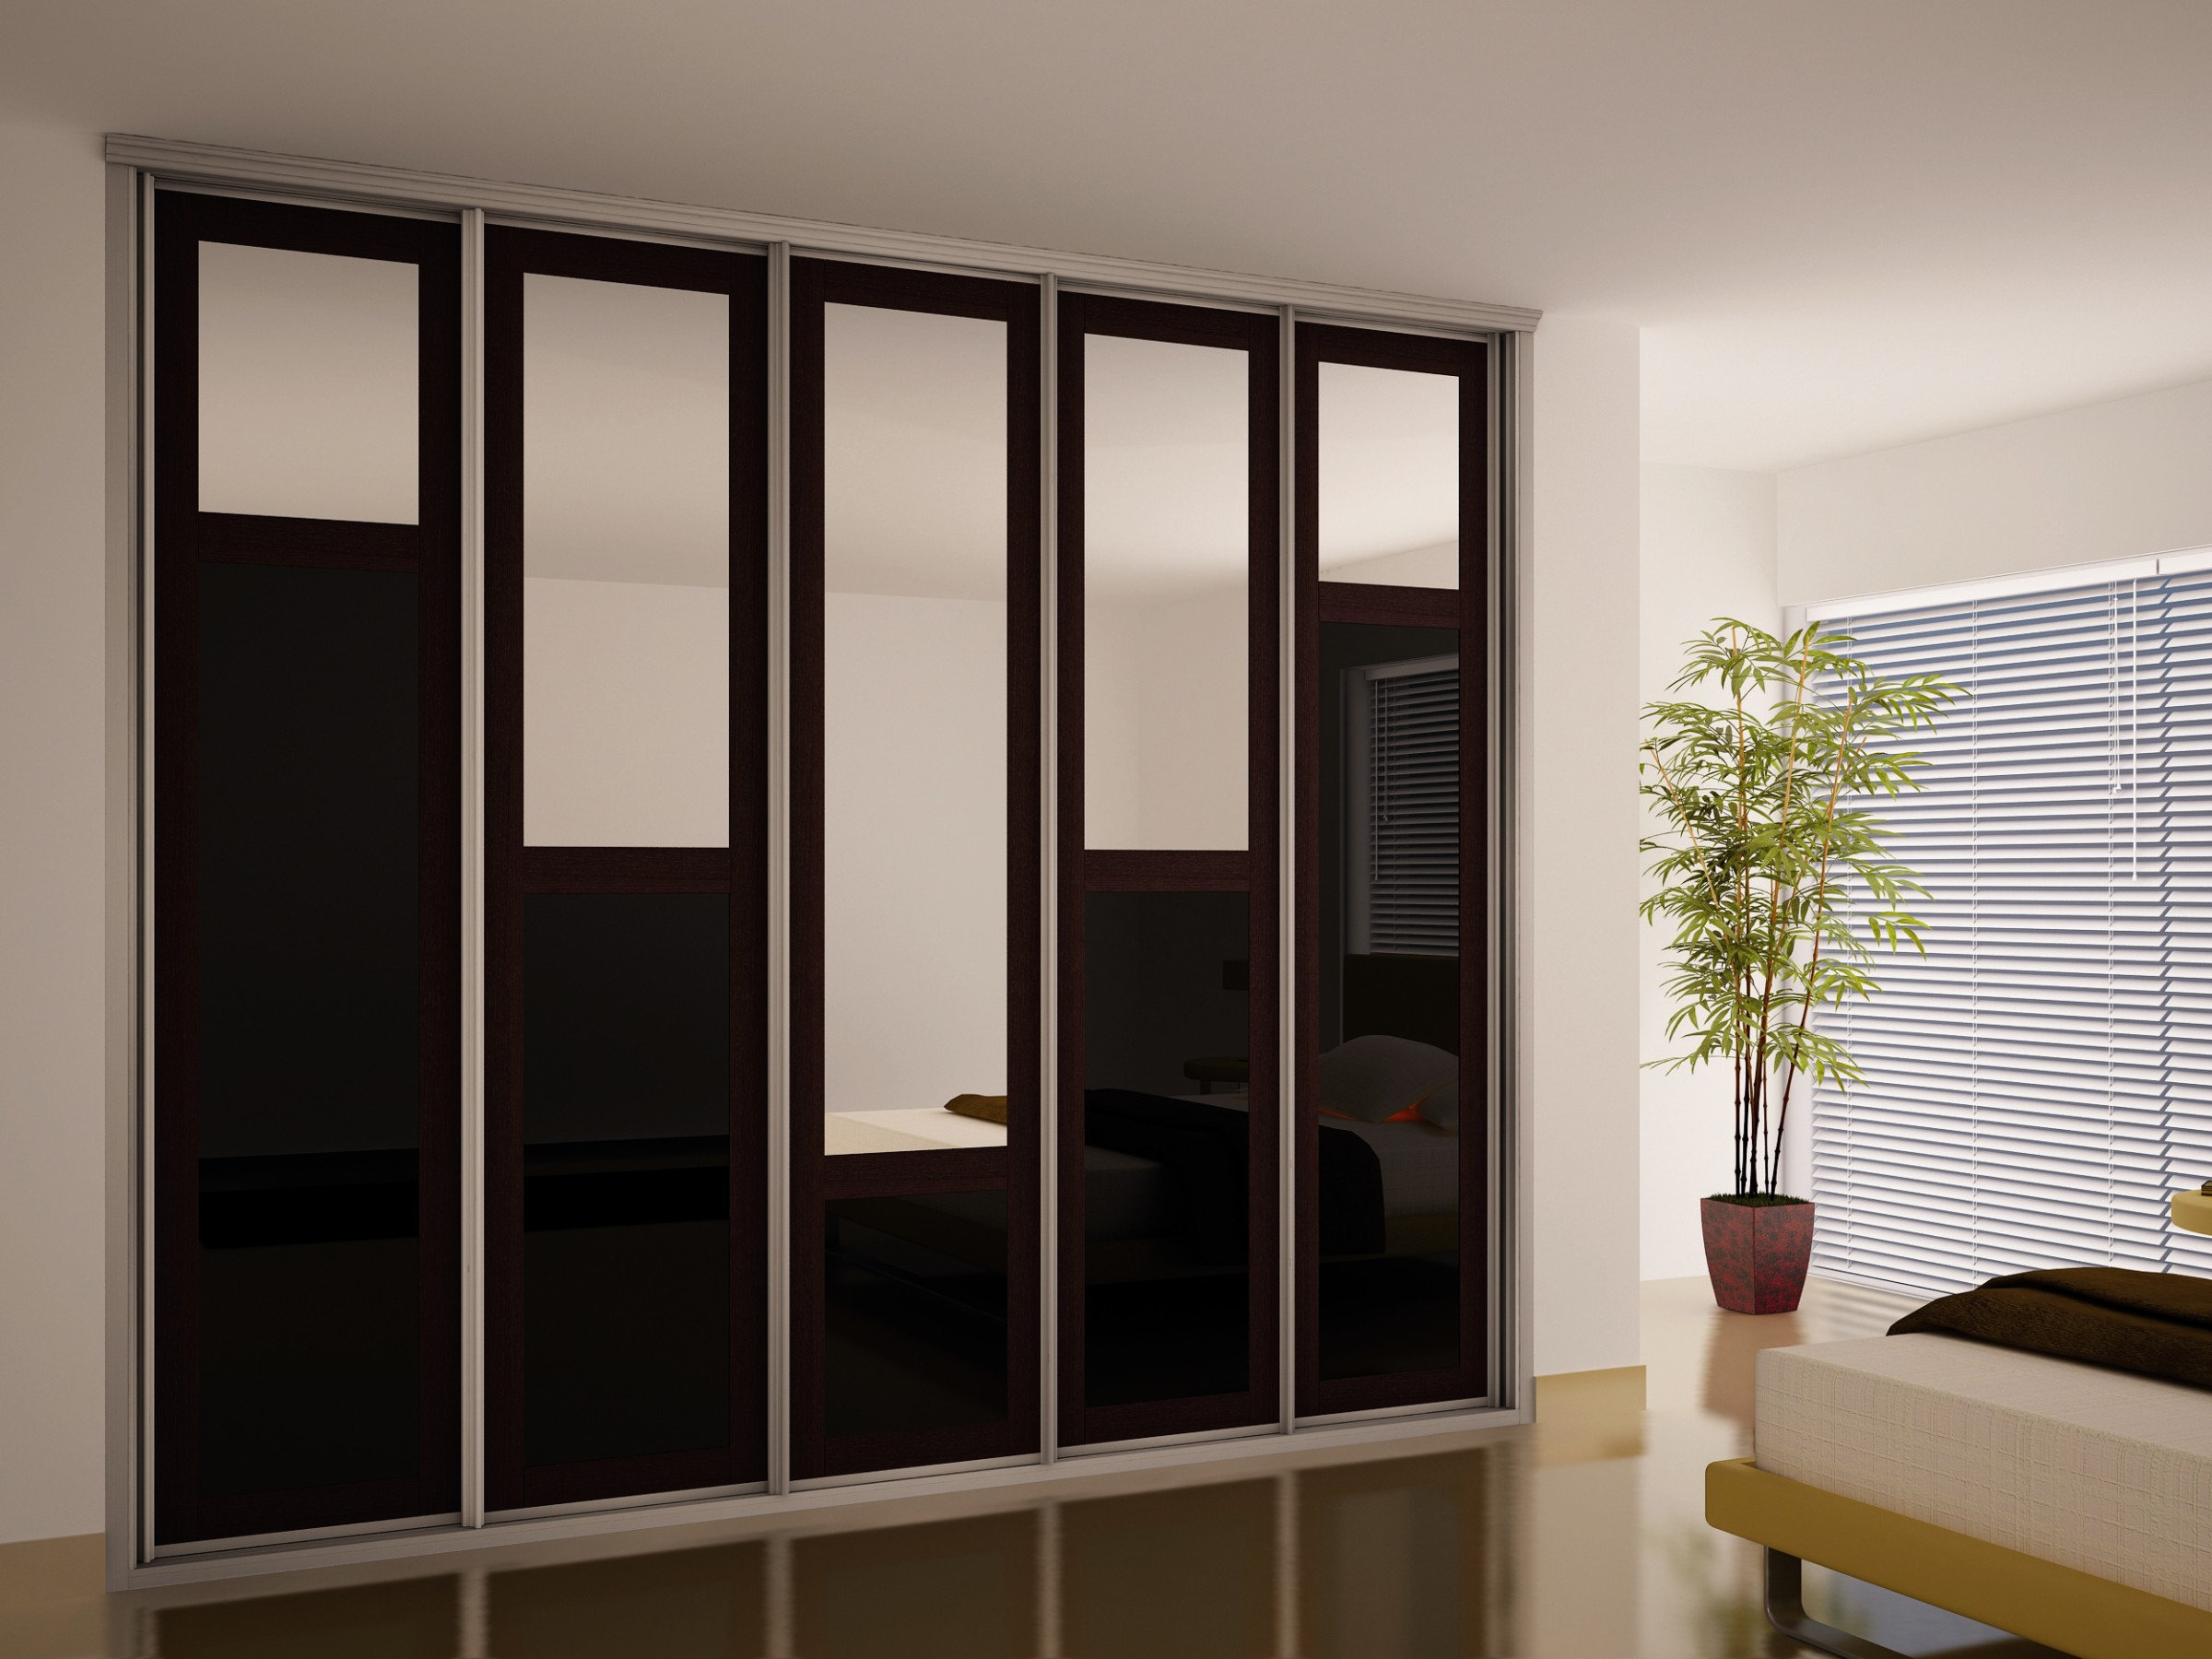 Frentes e interiores de armario nesu reformas - Interiores de armarios ...